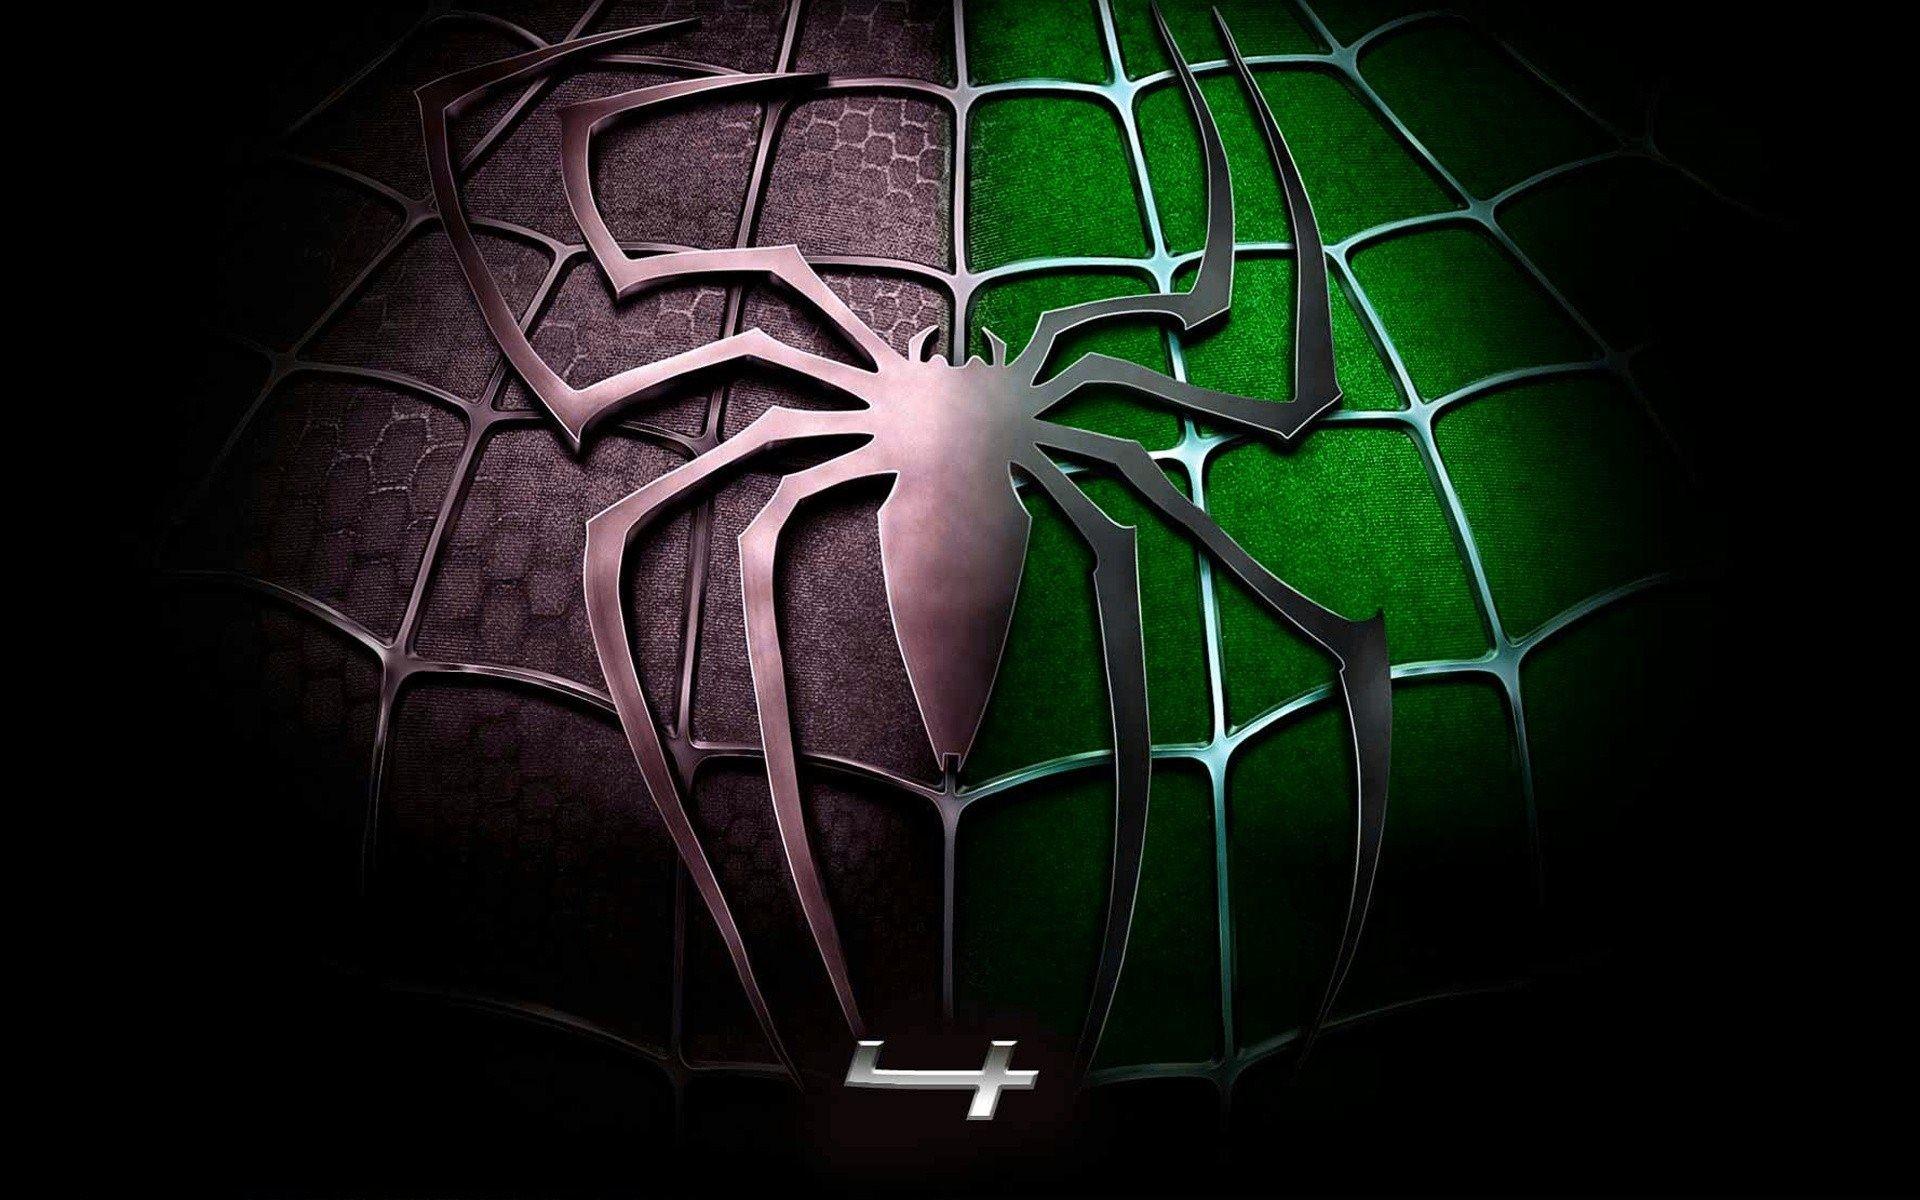 Spider Man Marvel Comics 3d Photos